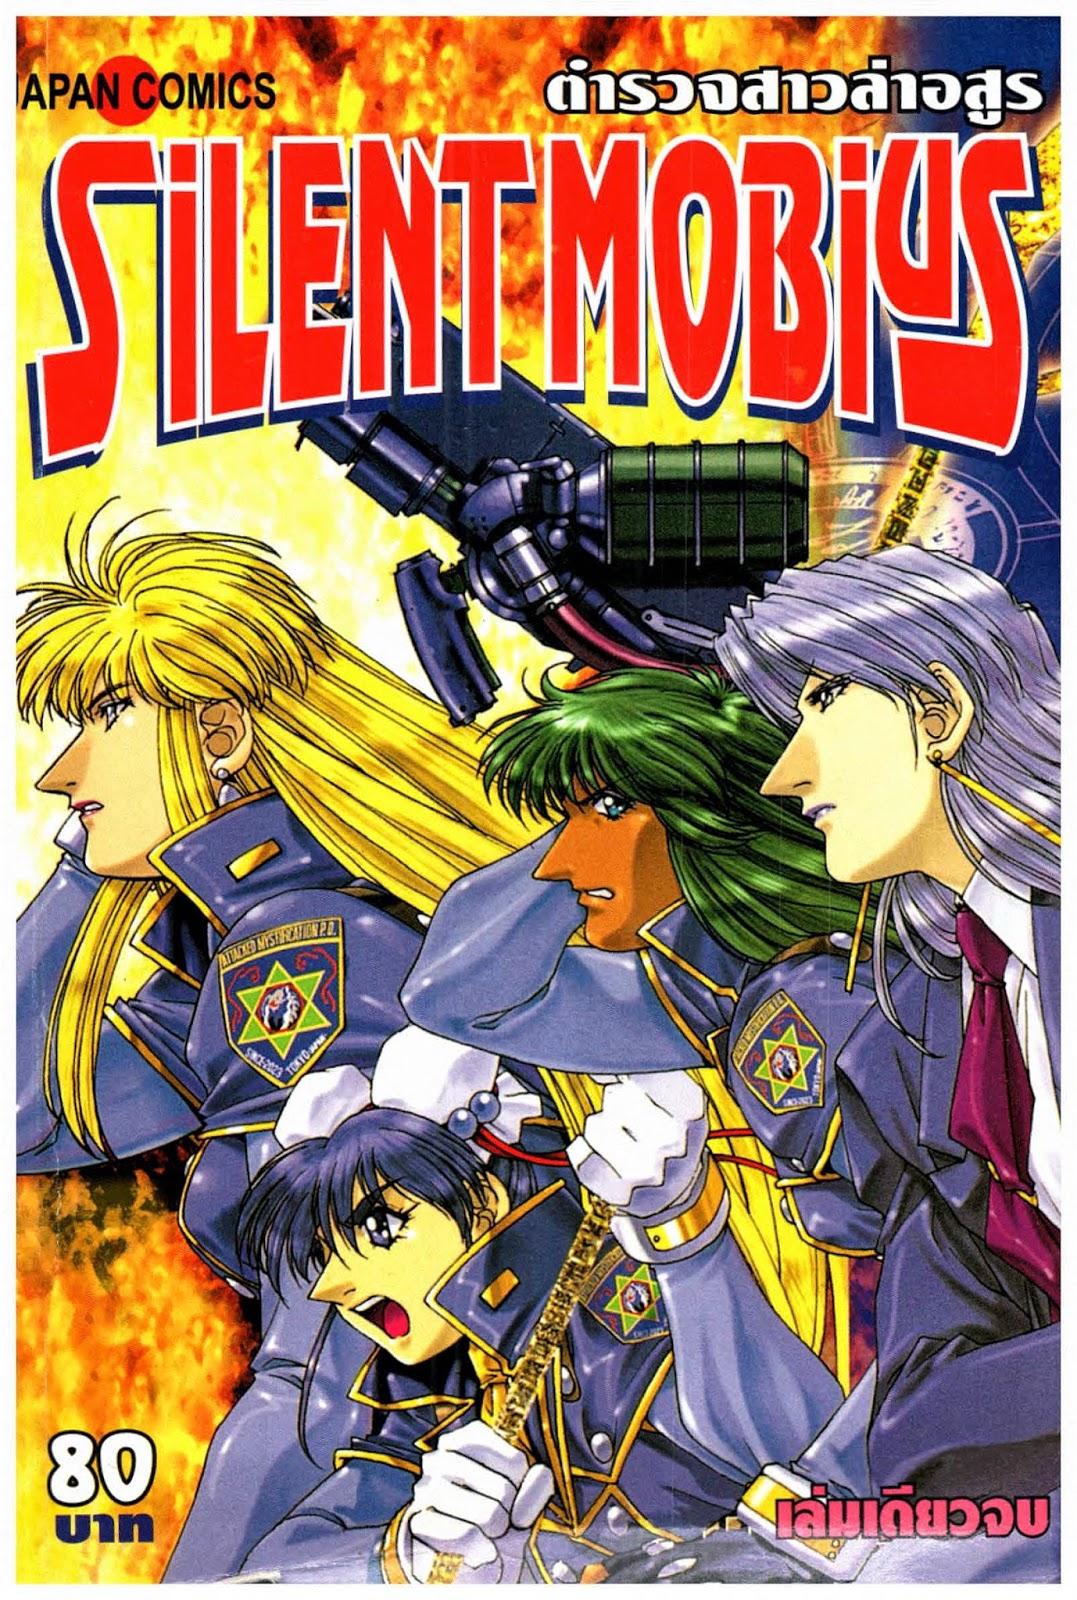 Silent Mobius ตำรวจสาวล่าอสูร ตอนที่ 1-17